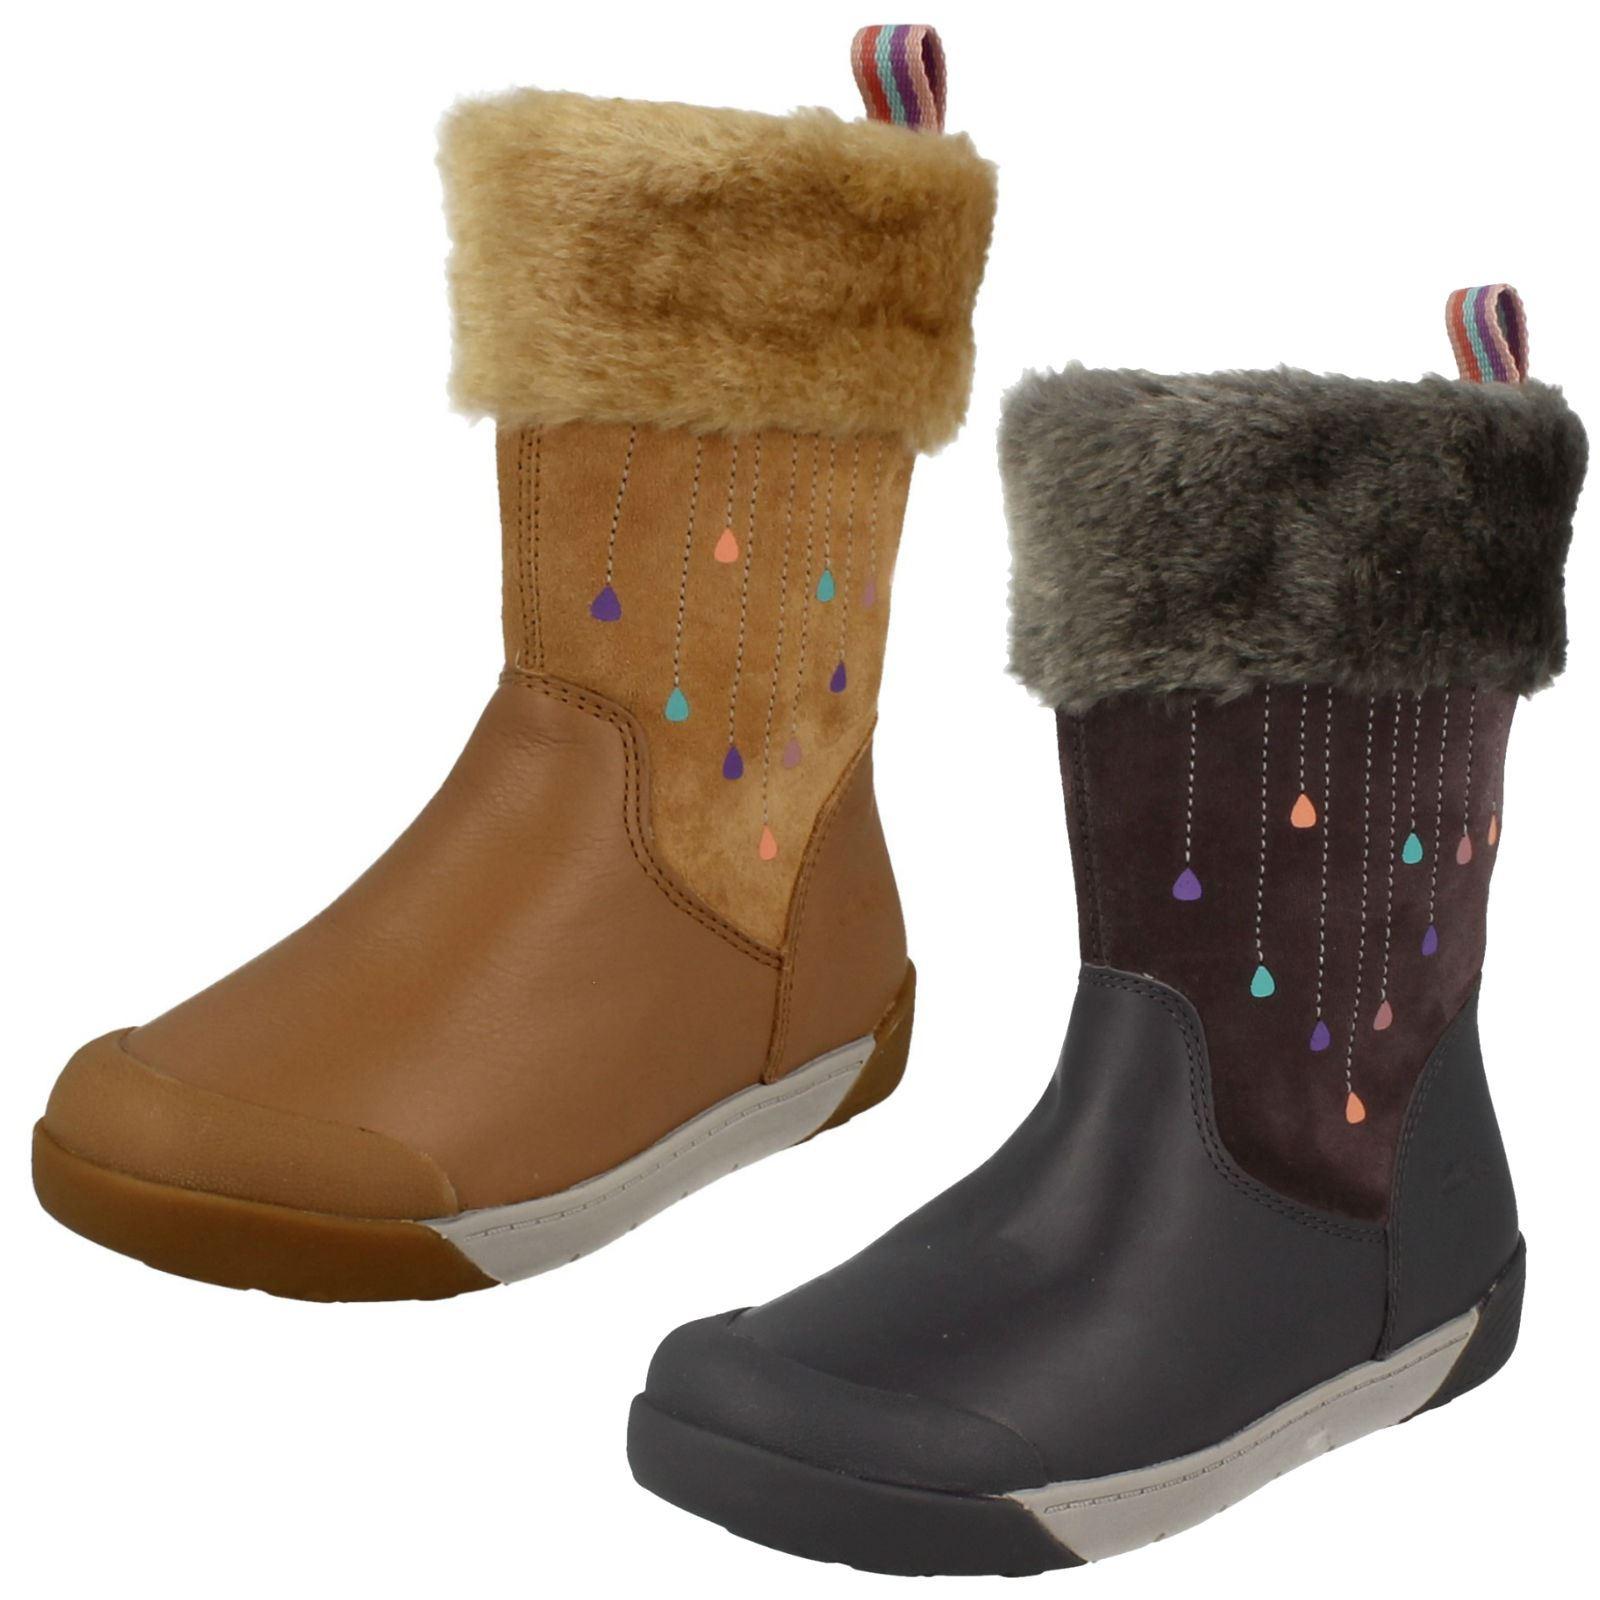 2a81f1e397c8a Details about Girls Clarks Calf Length Winter Boots Lil Folk Rae